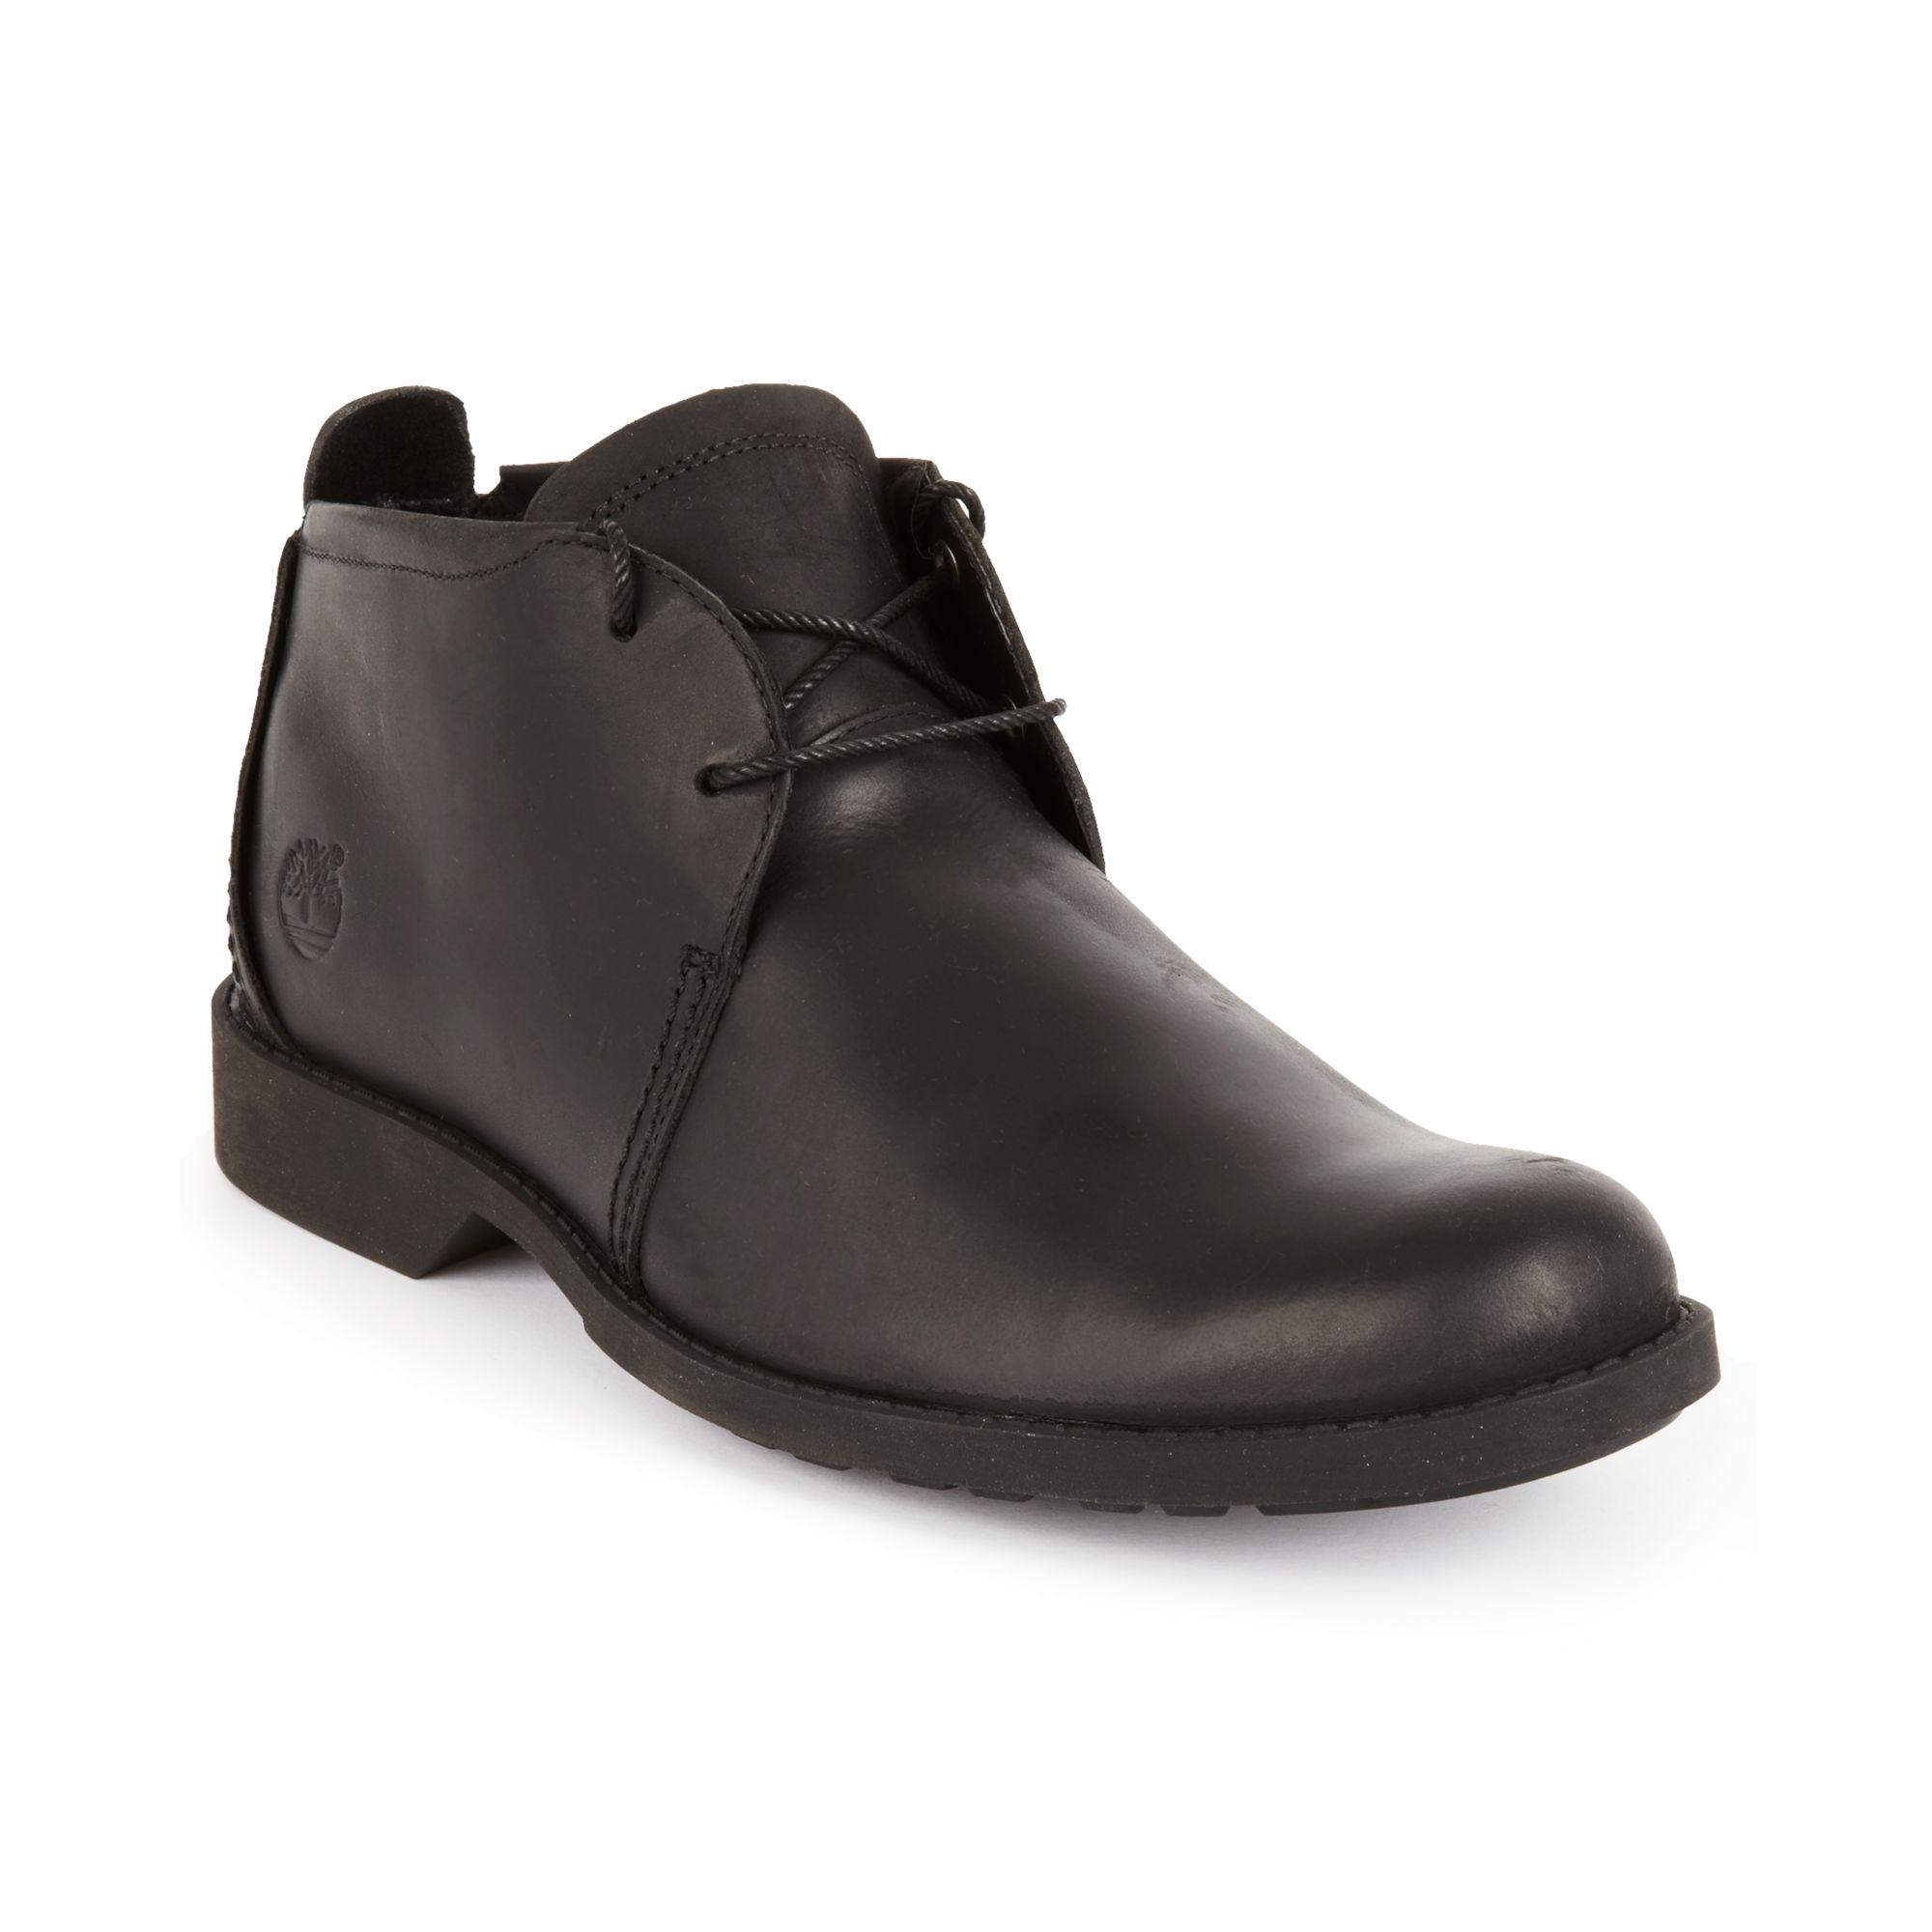 Timberland Earthkeepers Rugged Original Chukka Boots